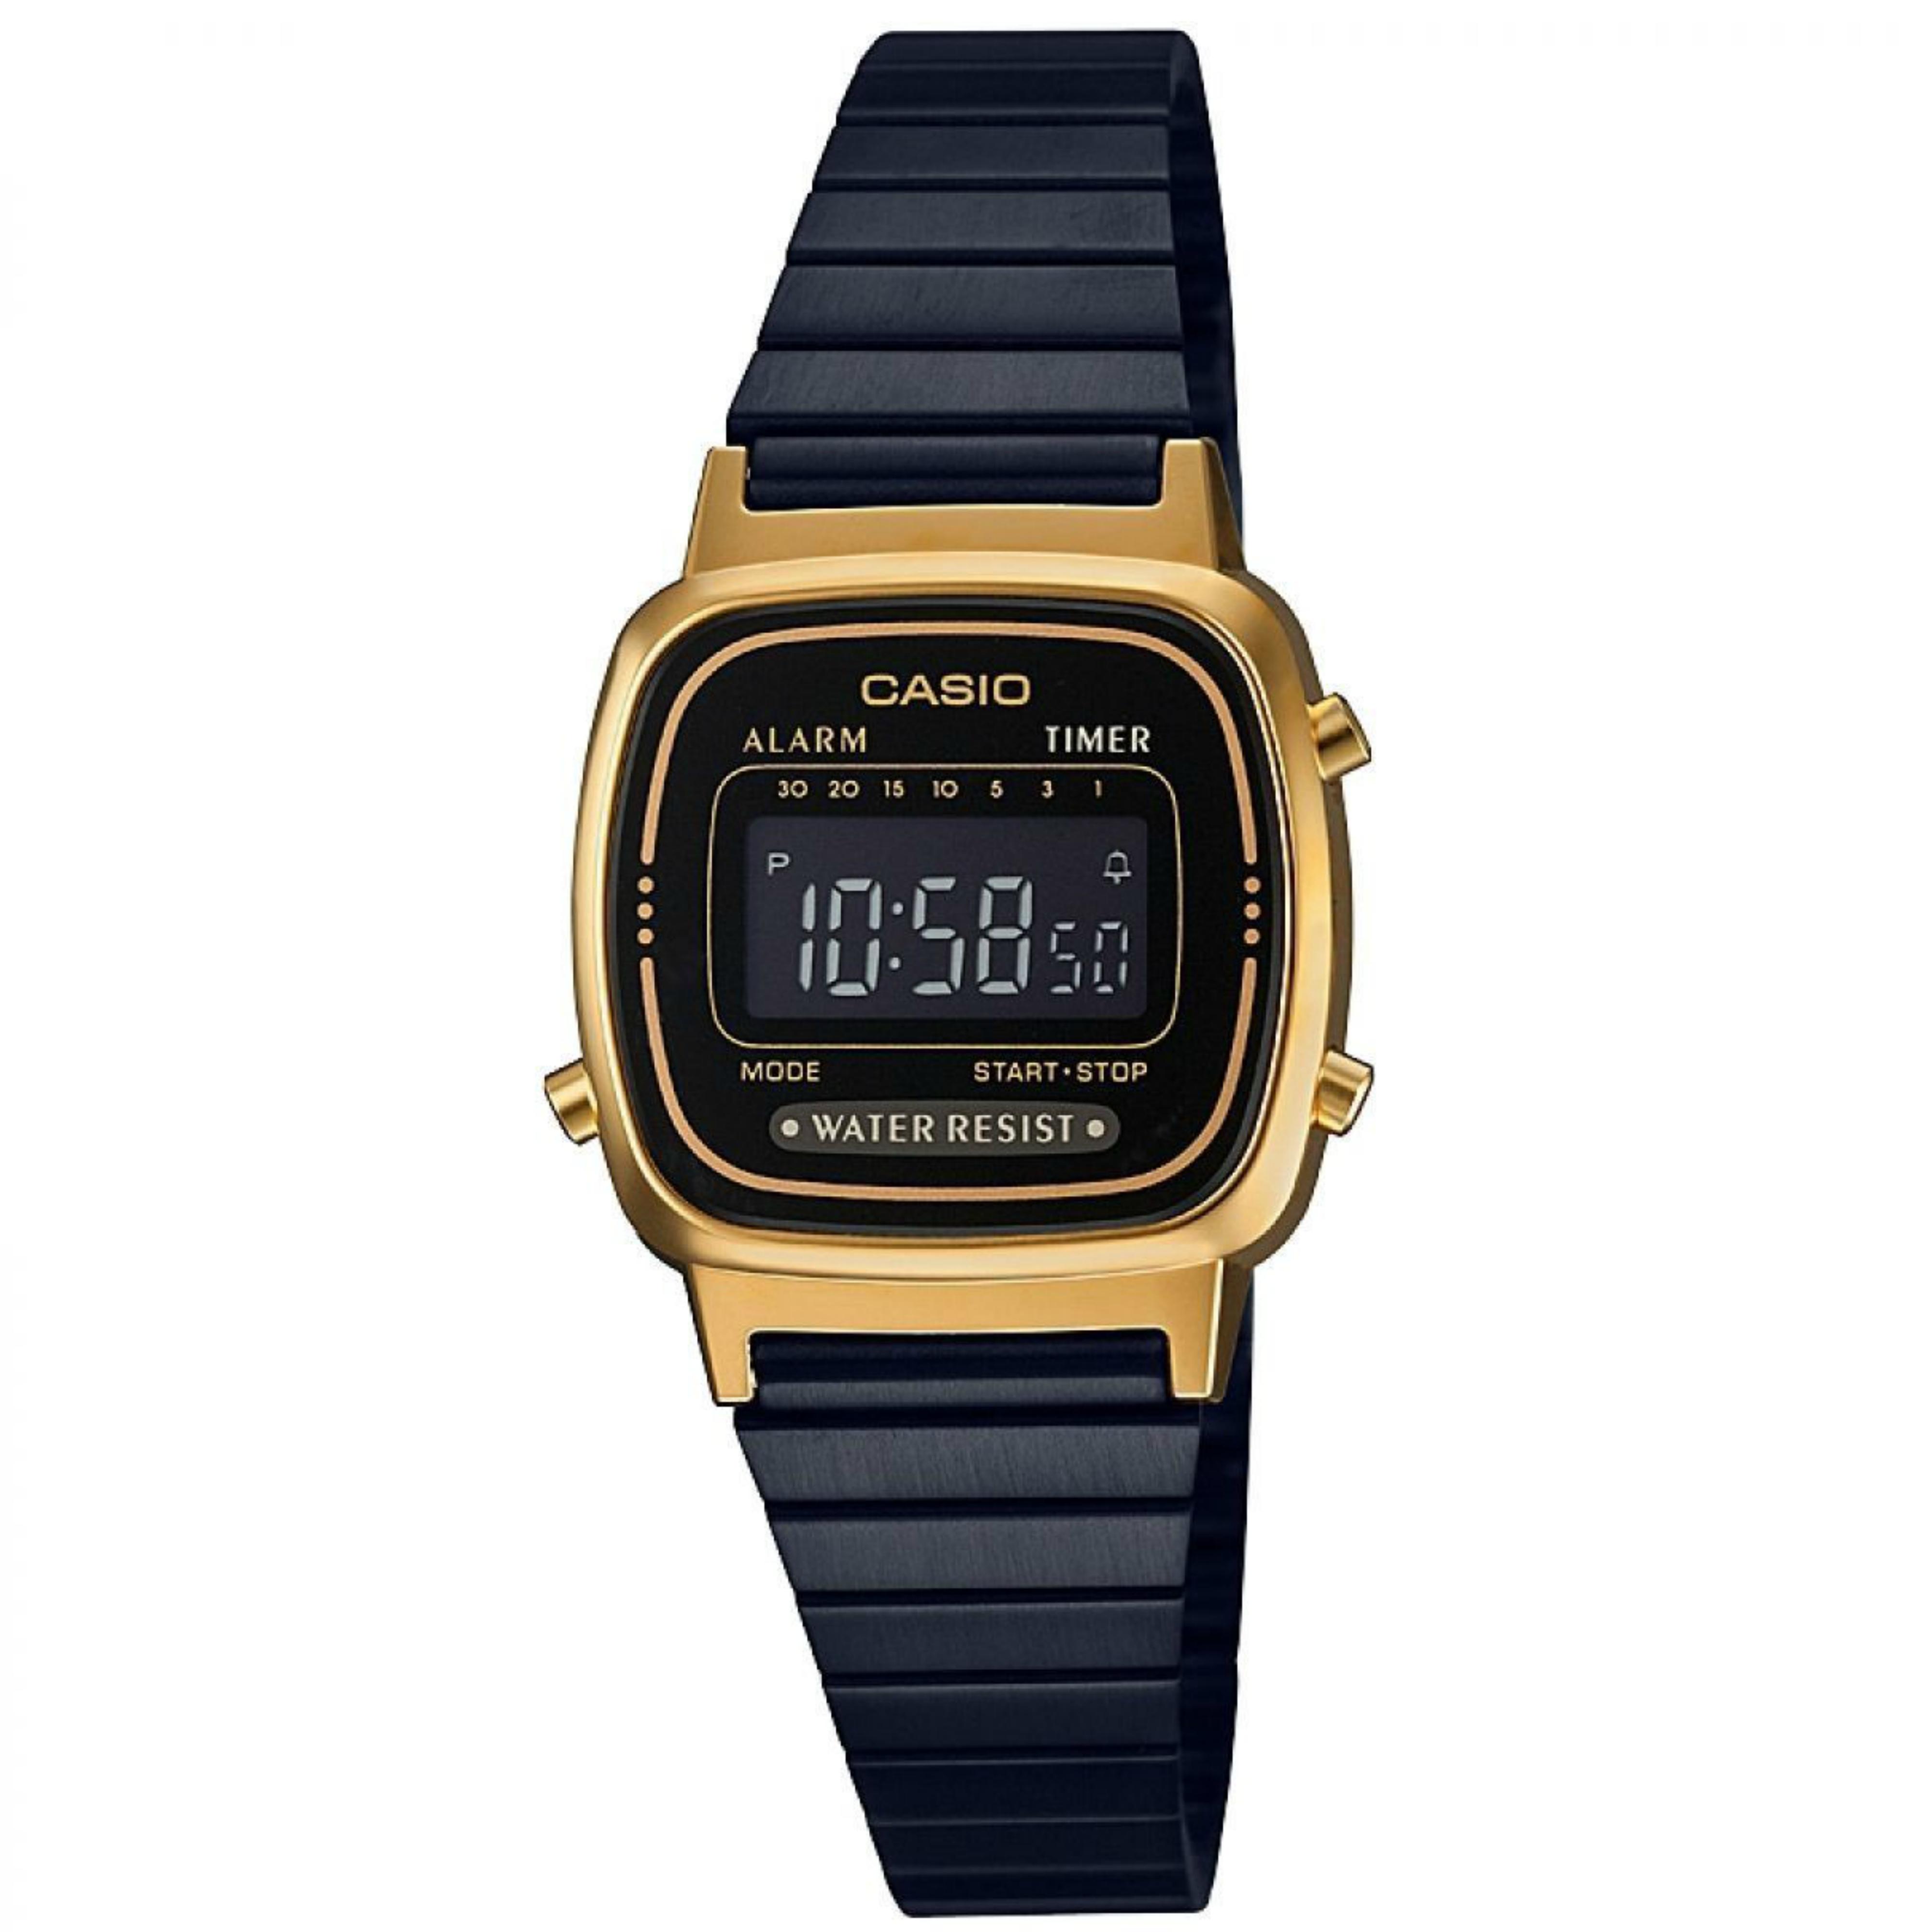 Casio Ladies' Degital Watch?Gold Plated Retro Shape-Black Dial?LA670WEGB-1BEF